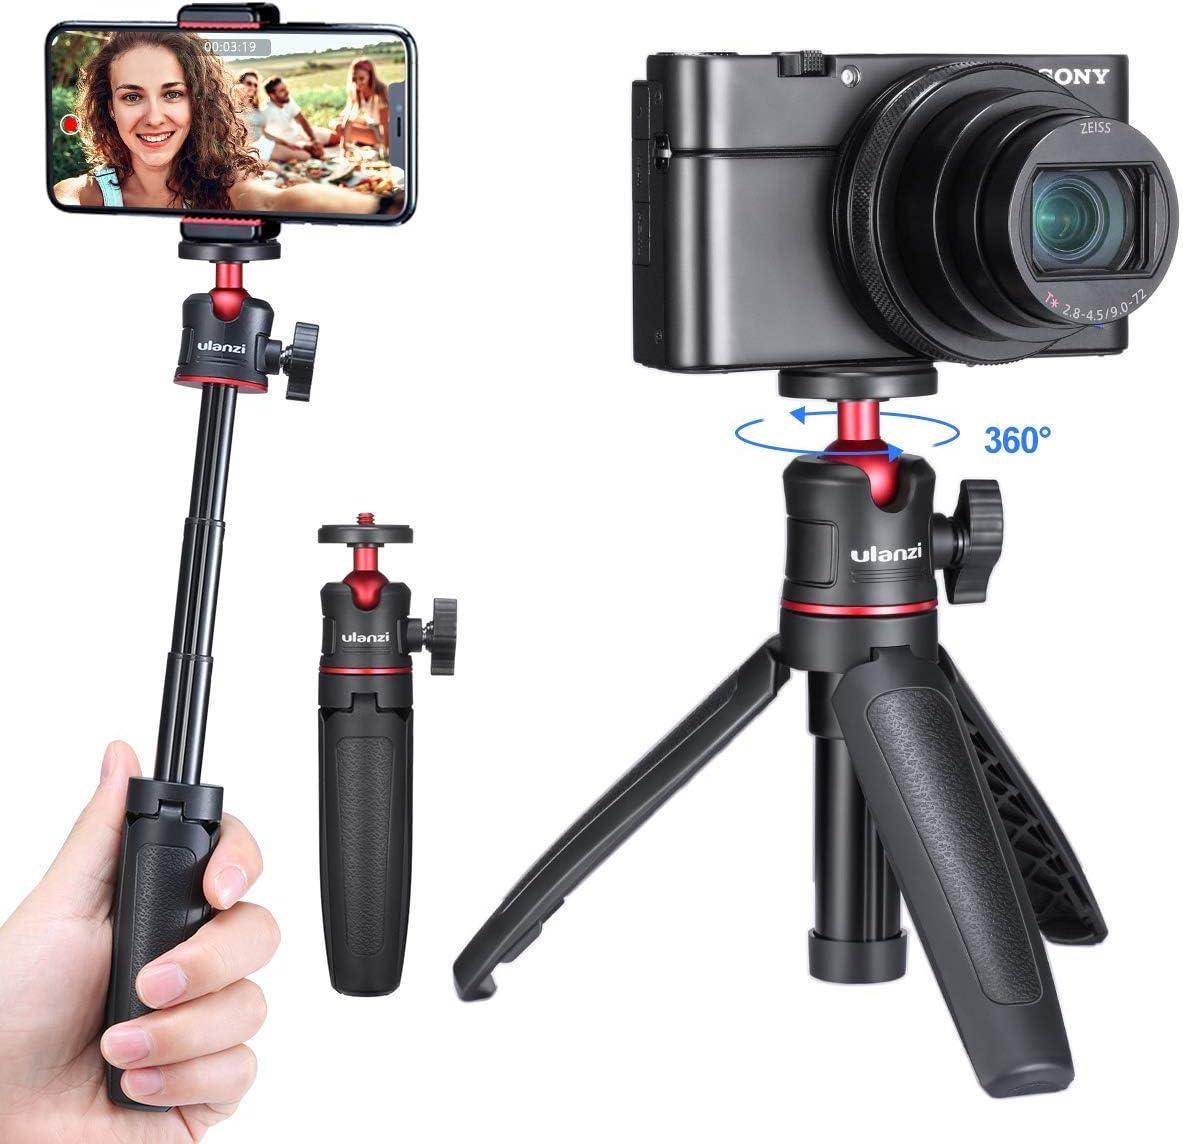 ULANZI MT-08 Extension Pole Tripod, Mini Selfie Stick Tripod Stand Handle Grip for iPhone 11 Pro Max Samsung OnePlus Google Smartphone Canon G7X Mark III Sony RX100 VII A6400 A6600 Cameras Vlogging